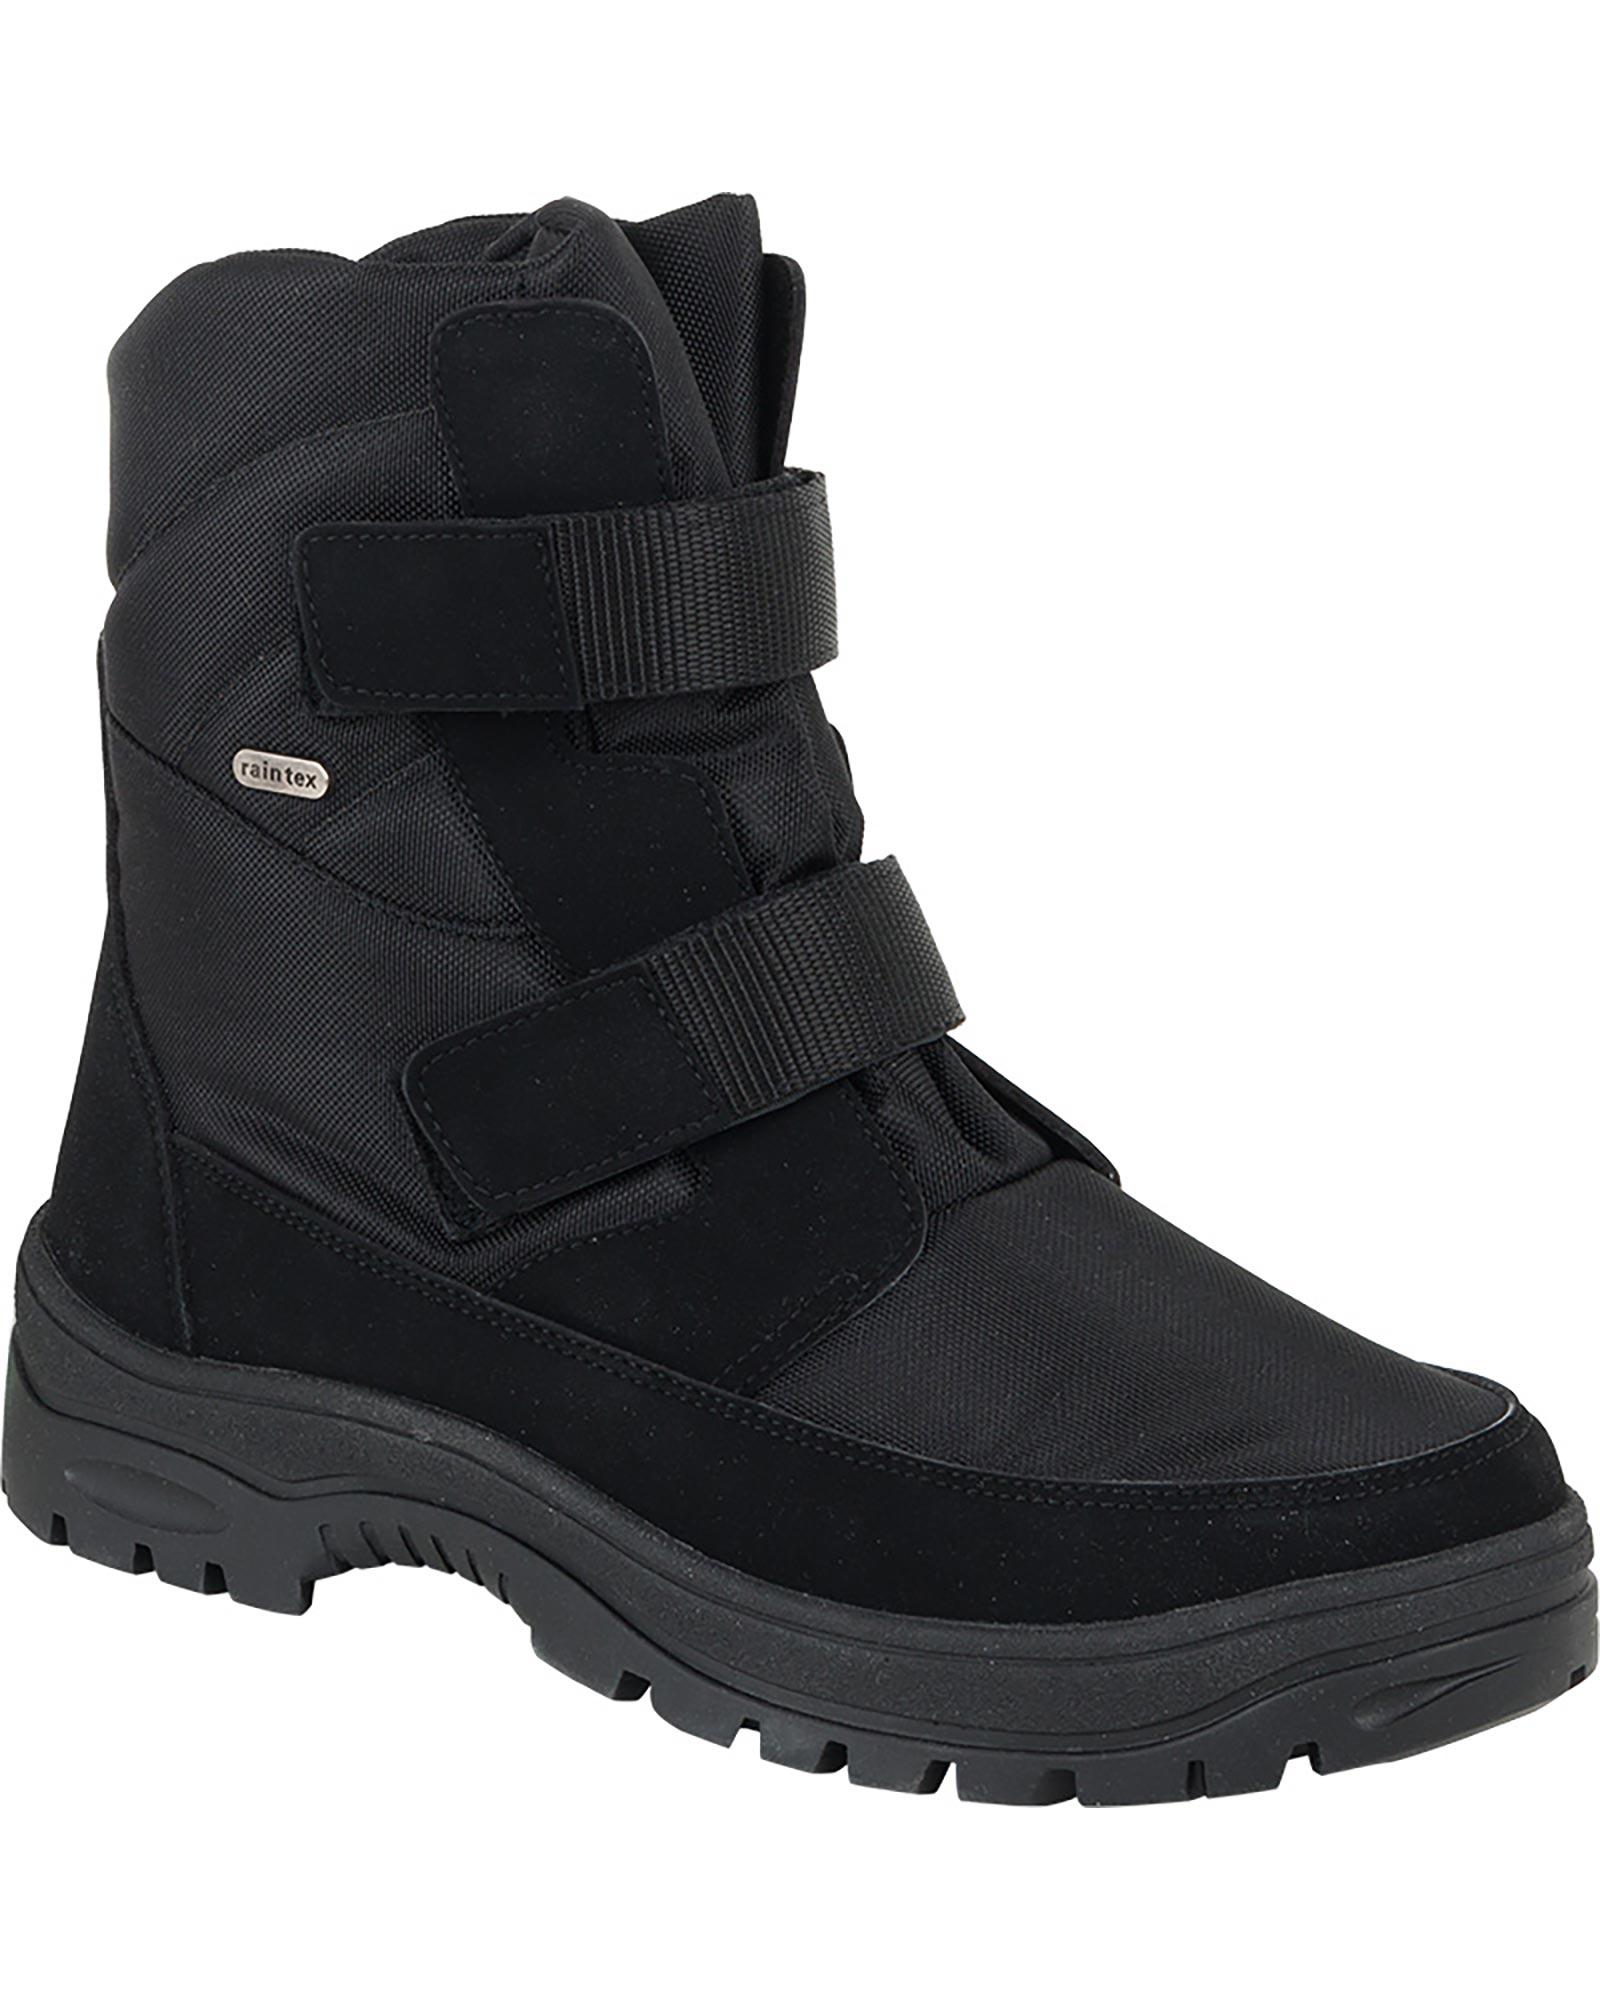 2a Mens Ny Tecnic Oc Snow Boot